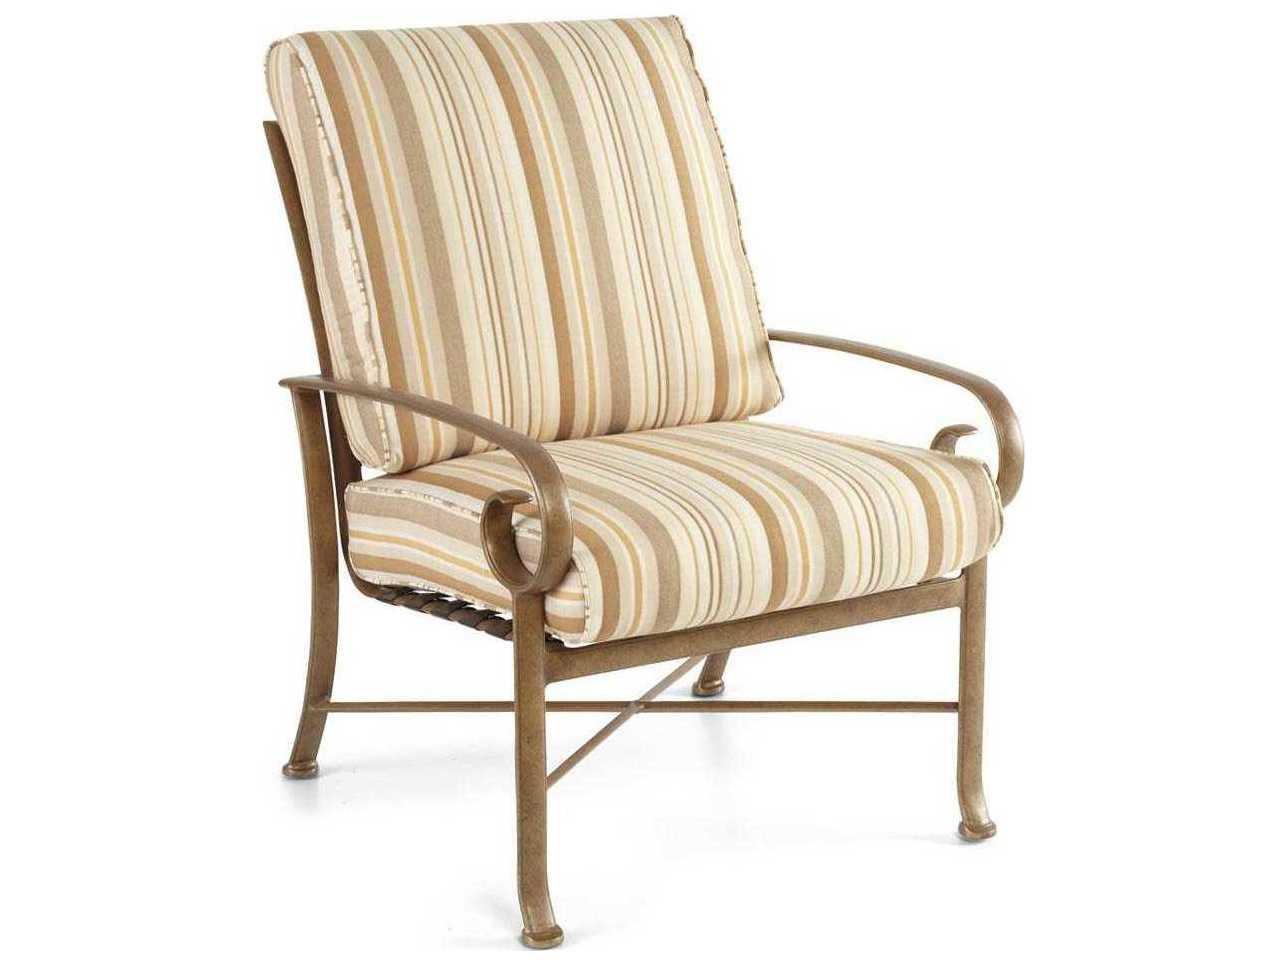 Winston Veneto Cushion Cast Aluminum Arm Lounge Chair